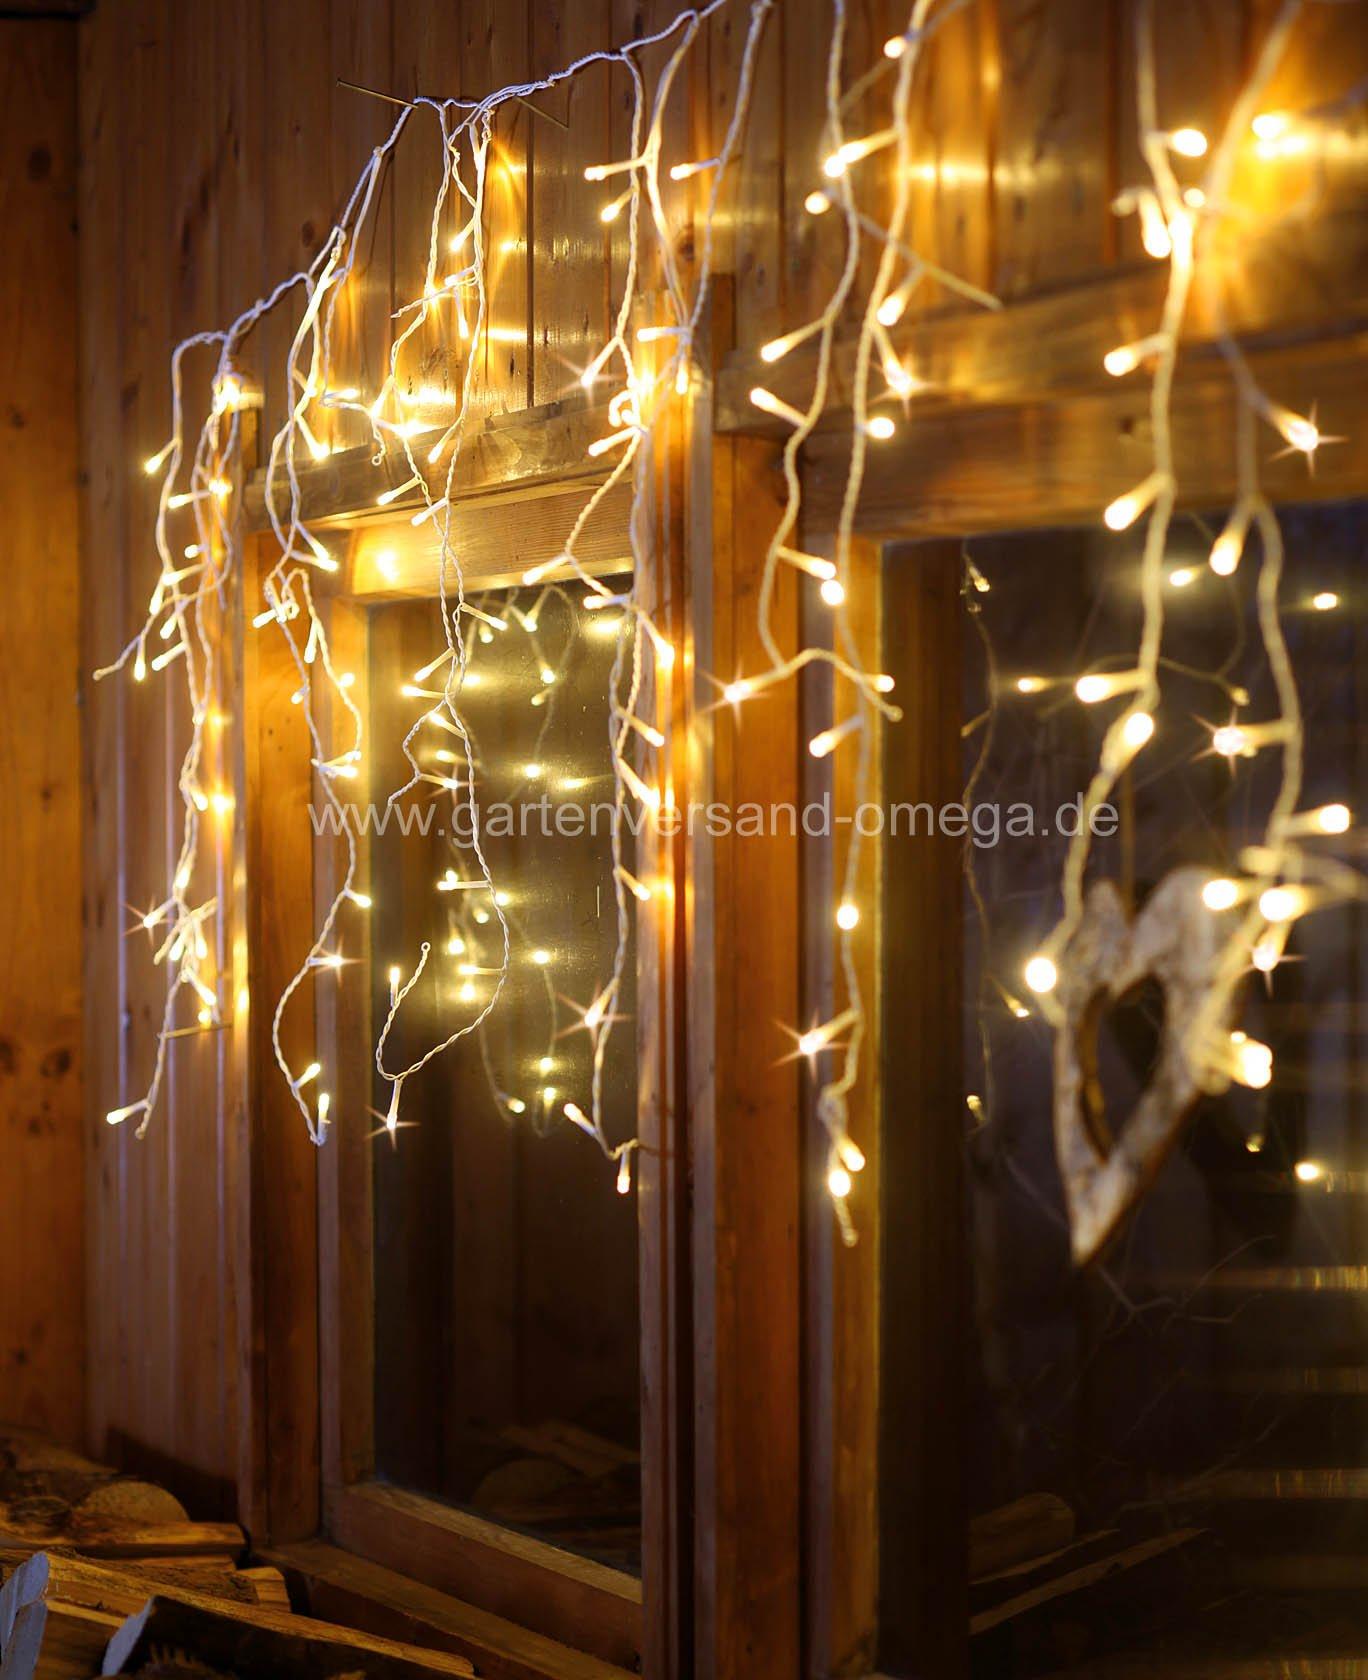 Weihnachtsbeleuchtung fenster innen my blog for Fenster weihnachtsbeleuchtung